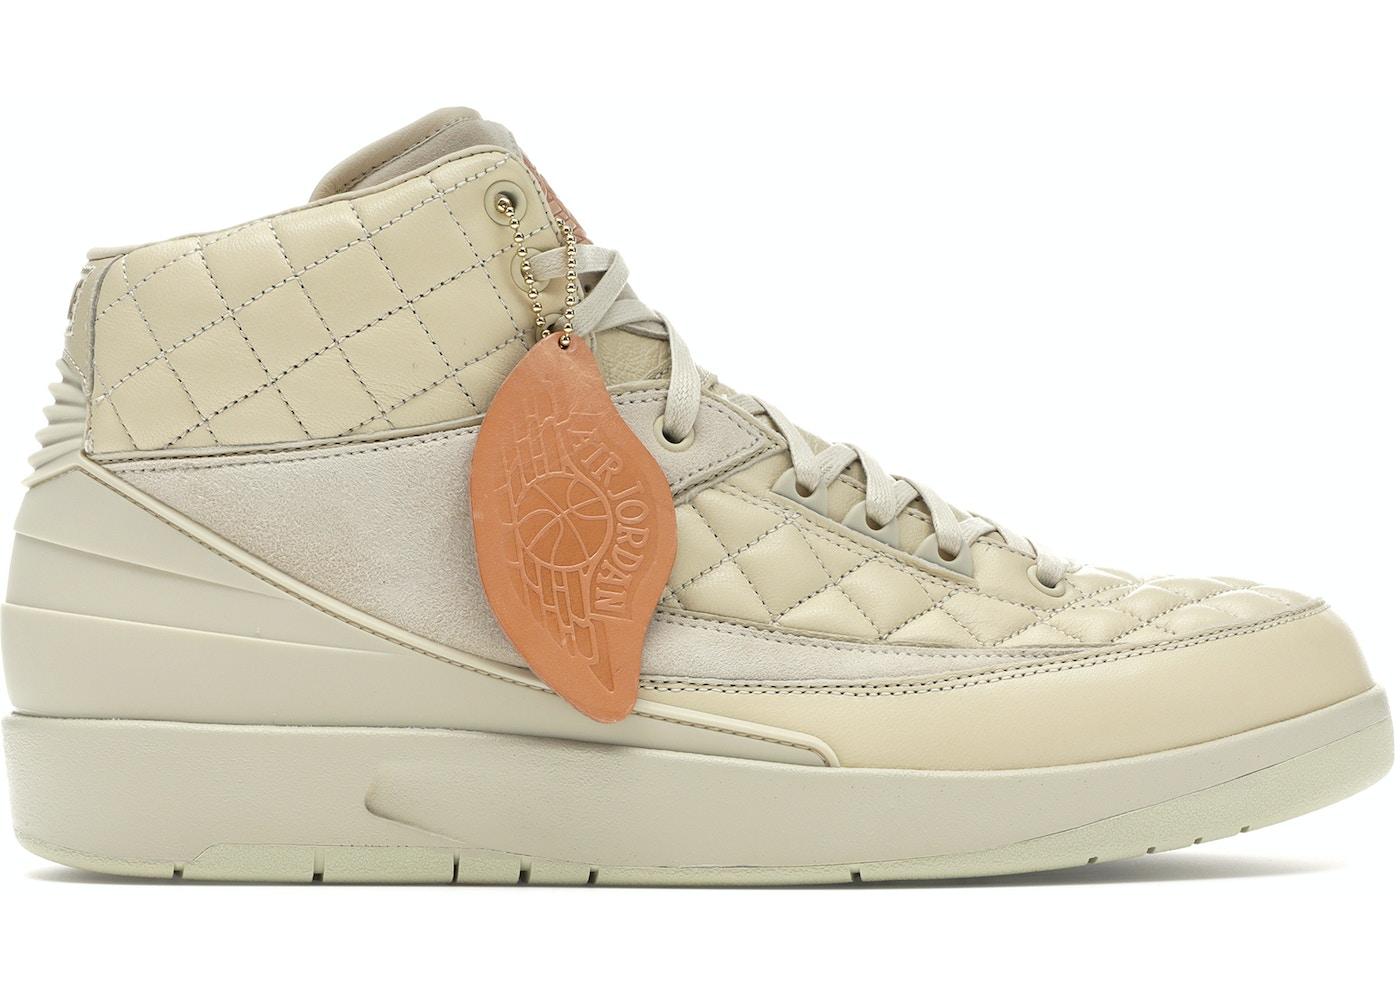 Buy Air Jordan 2 Shoes Deadstock Sneakers